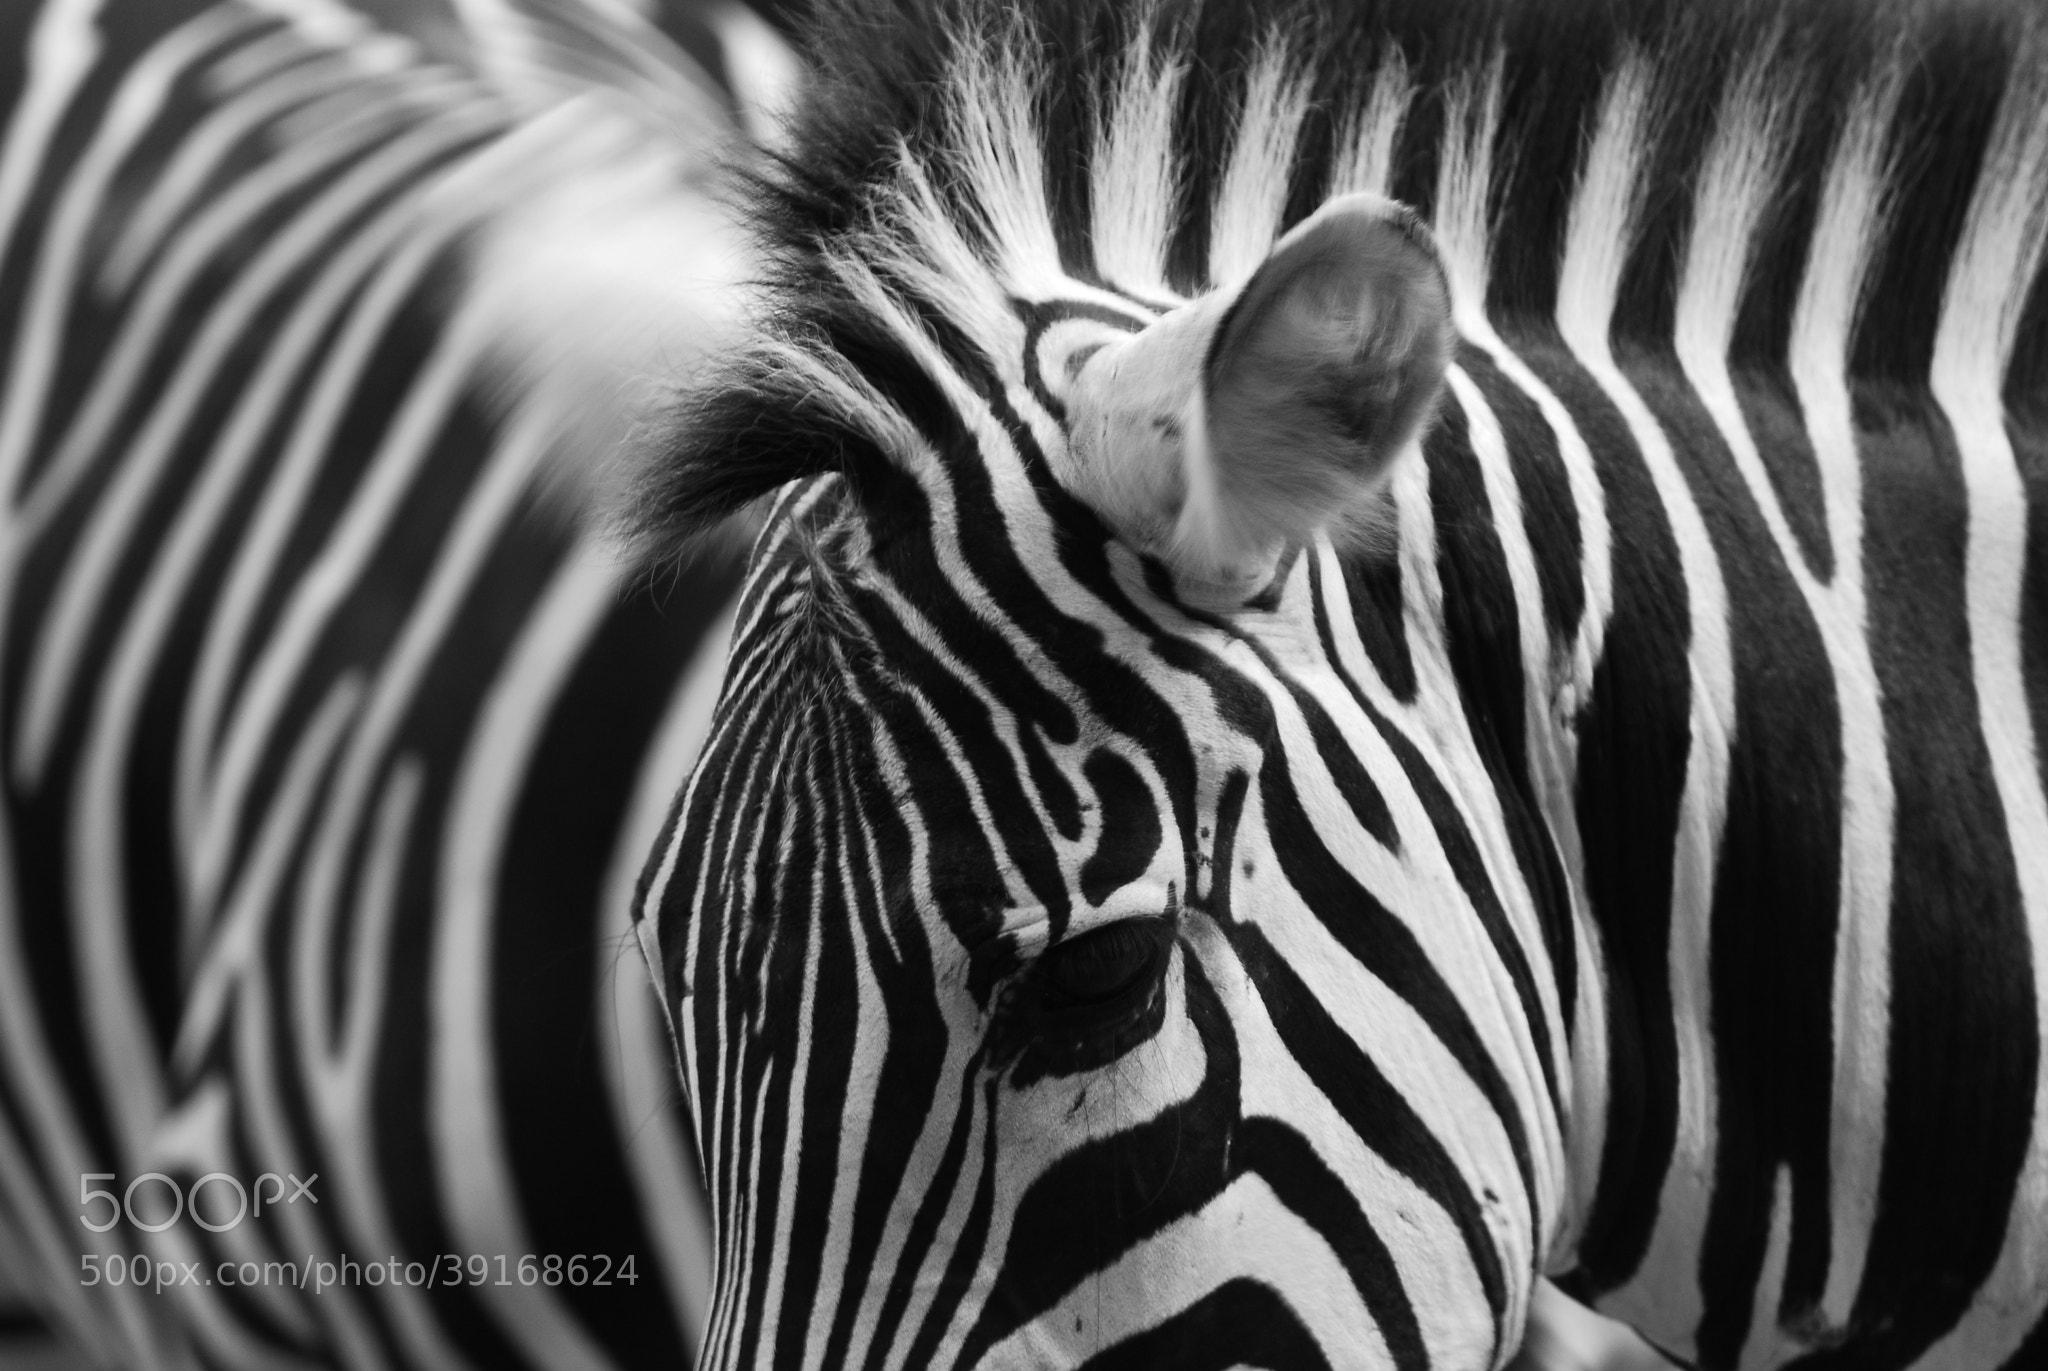 Photograph Zebra by Heshan  de Mel on 500px